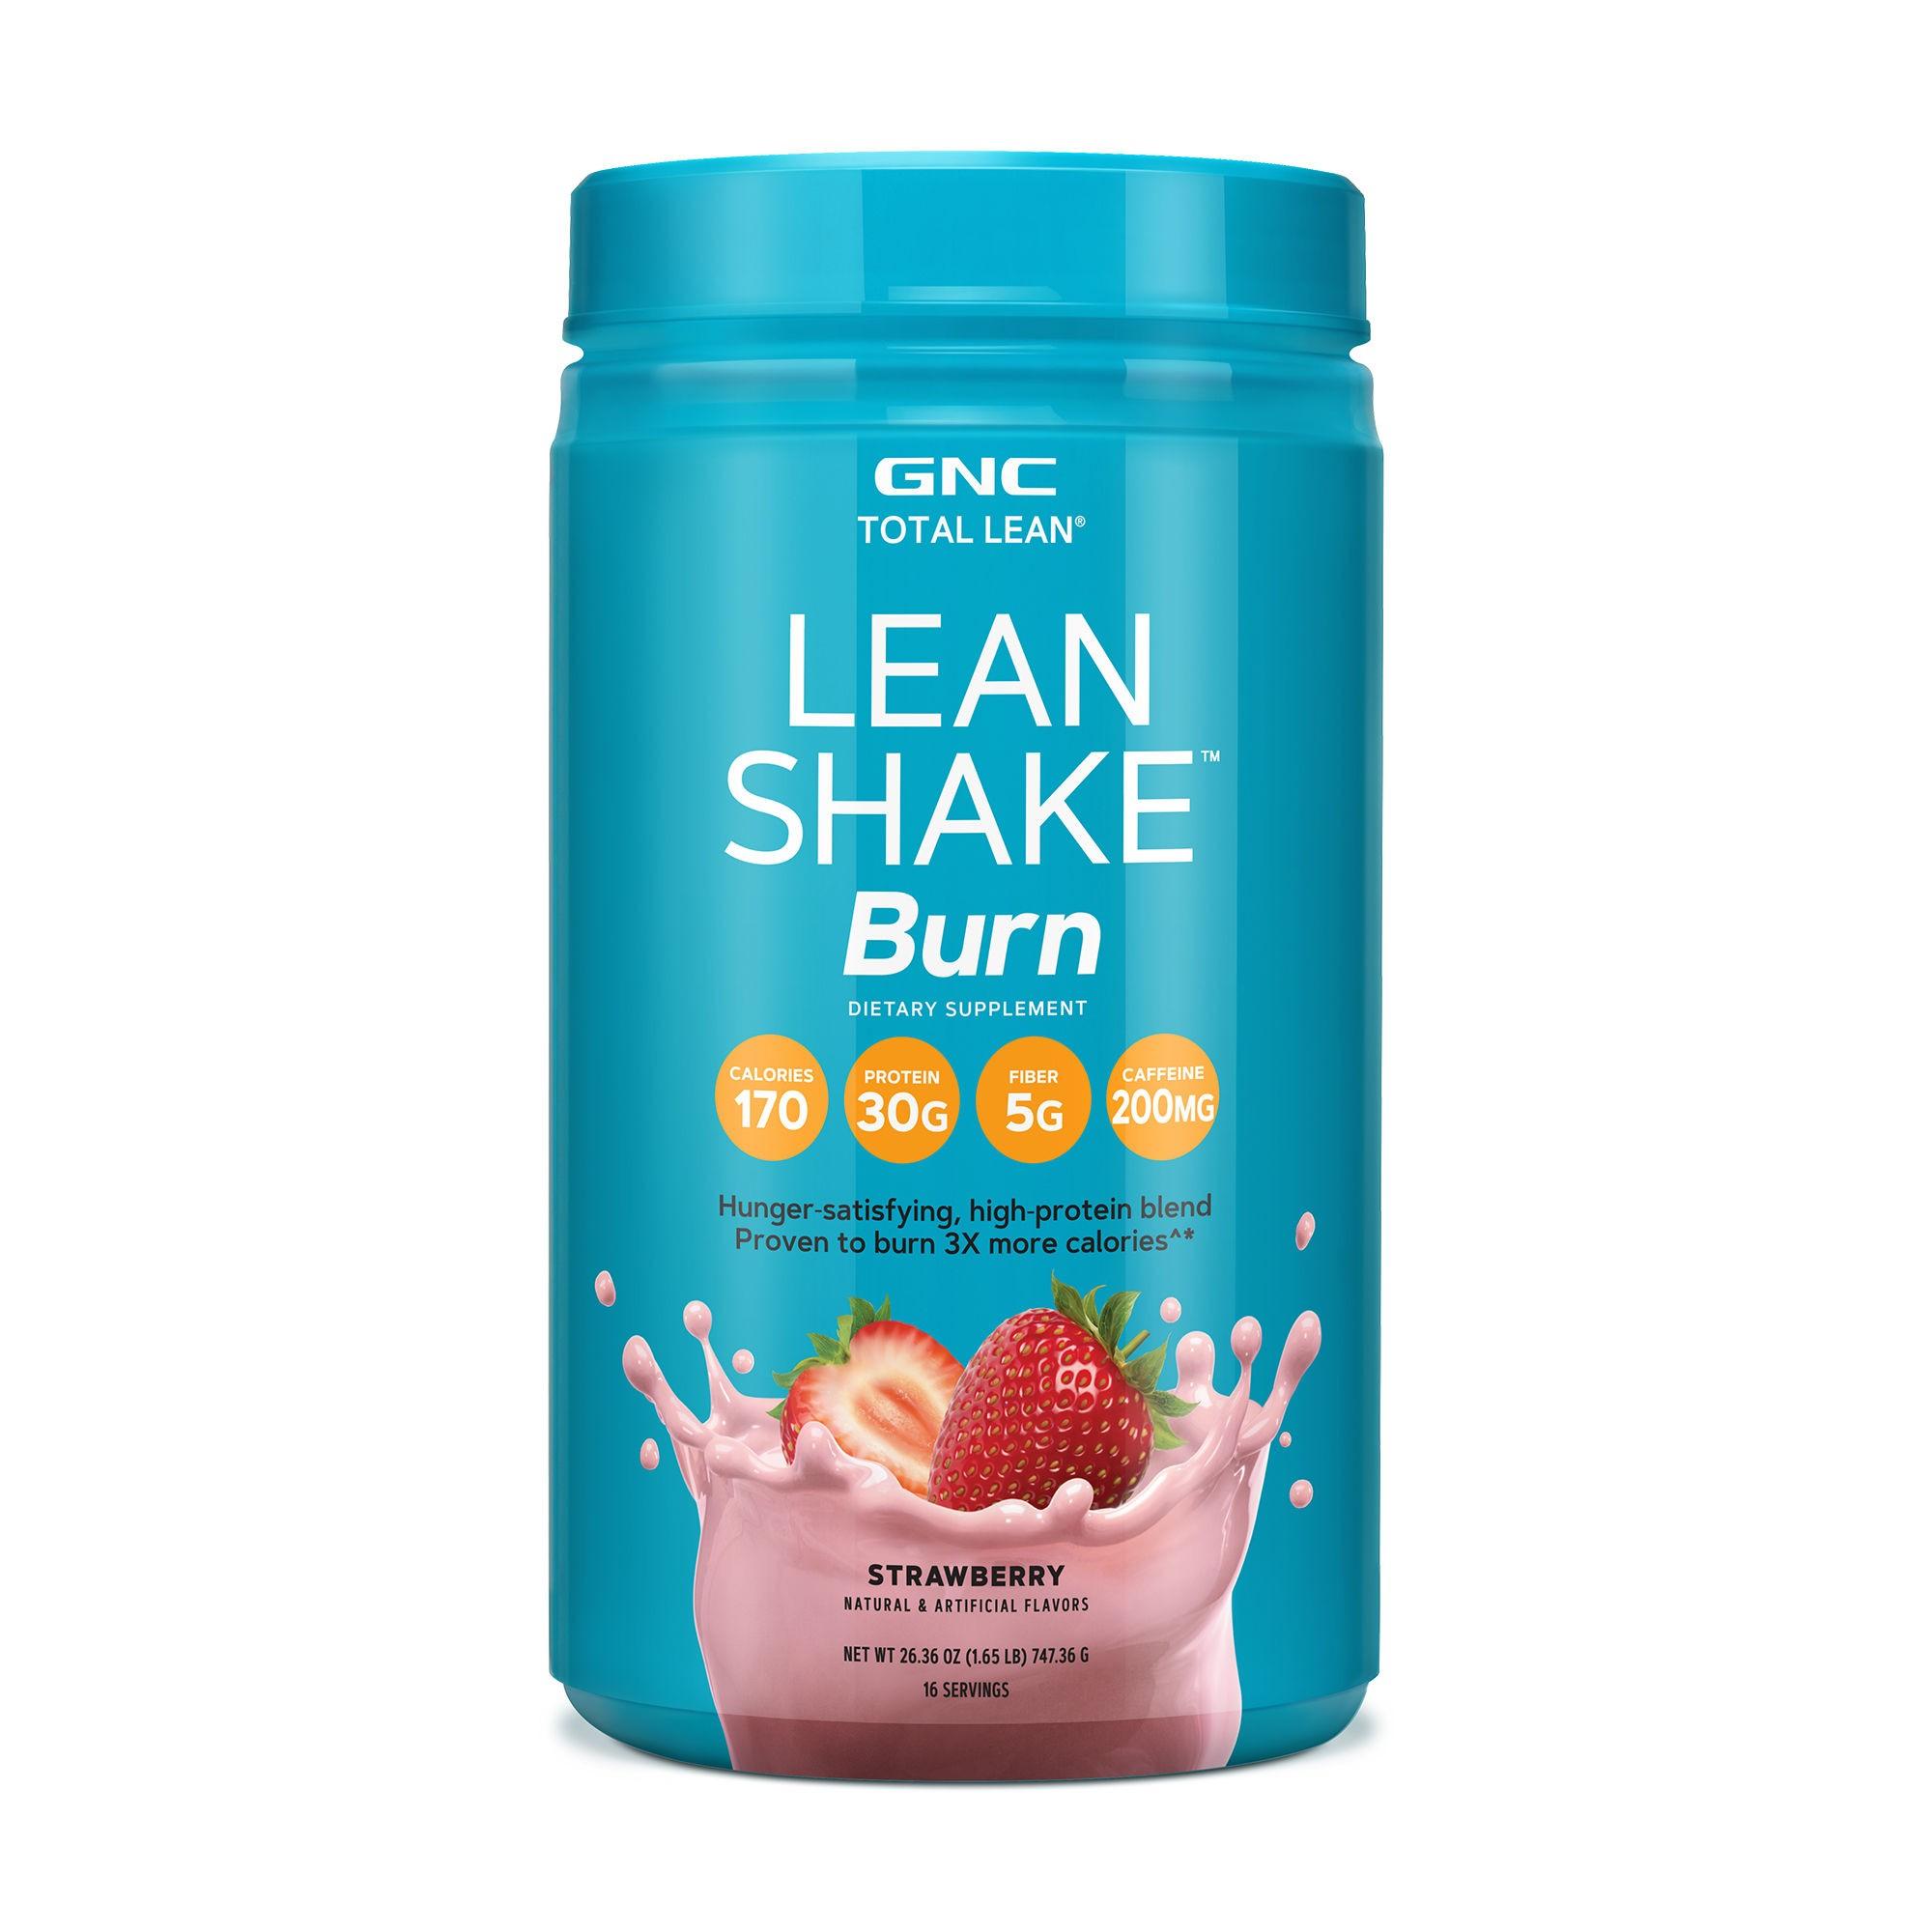 GNC Total Lean® Lean Shake™ Burn, Proteina cu Amestec Termogenic, cu Aroma de Capsuni, 747.36 g